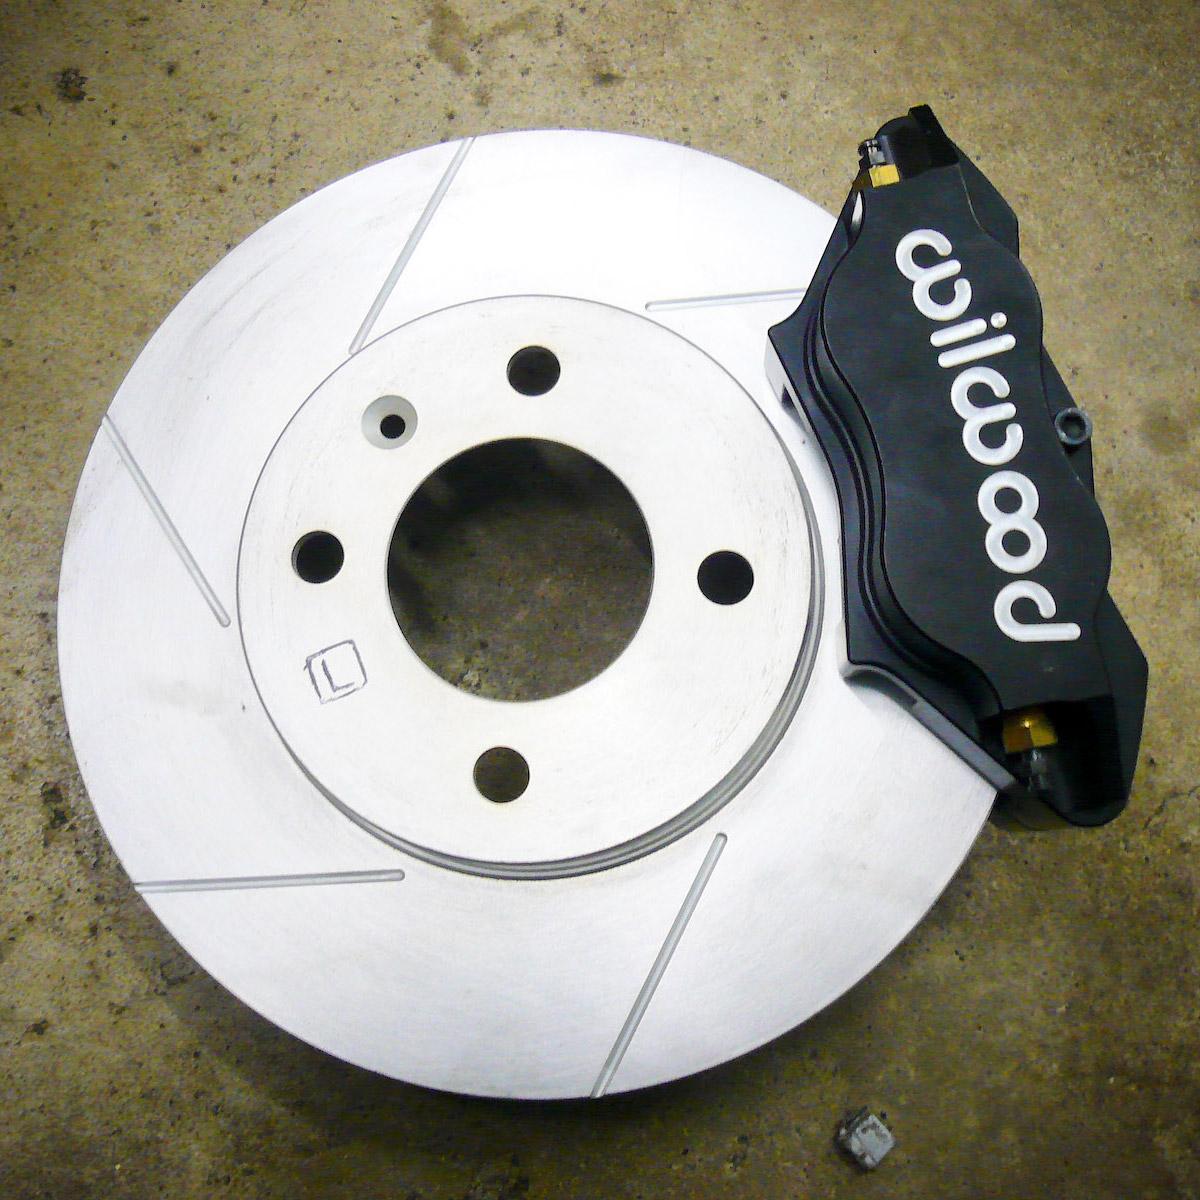 Brake Caliper Replacement Costs Repairs Autoguru When To Change Pads